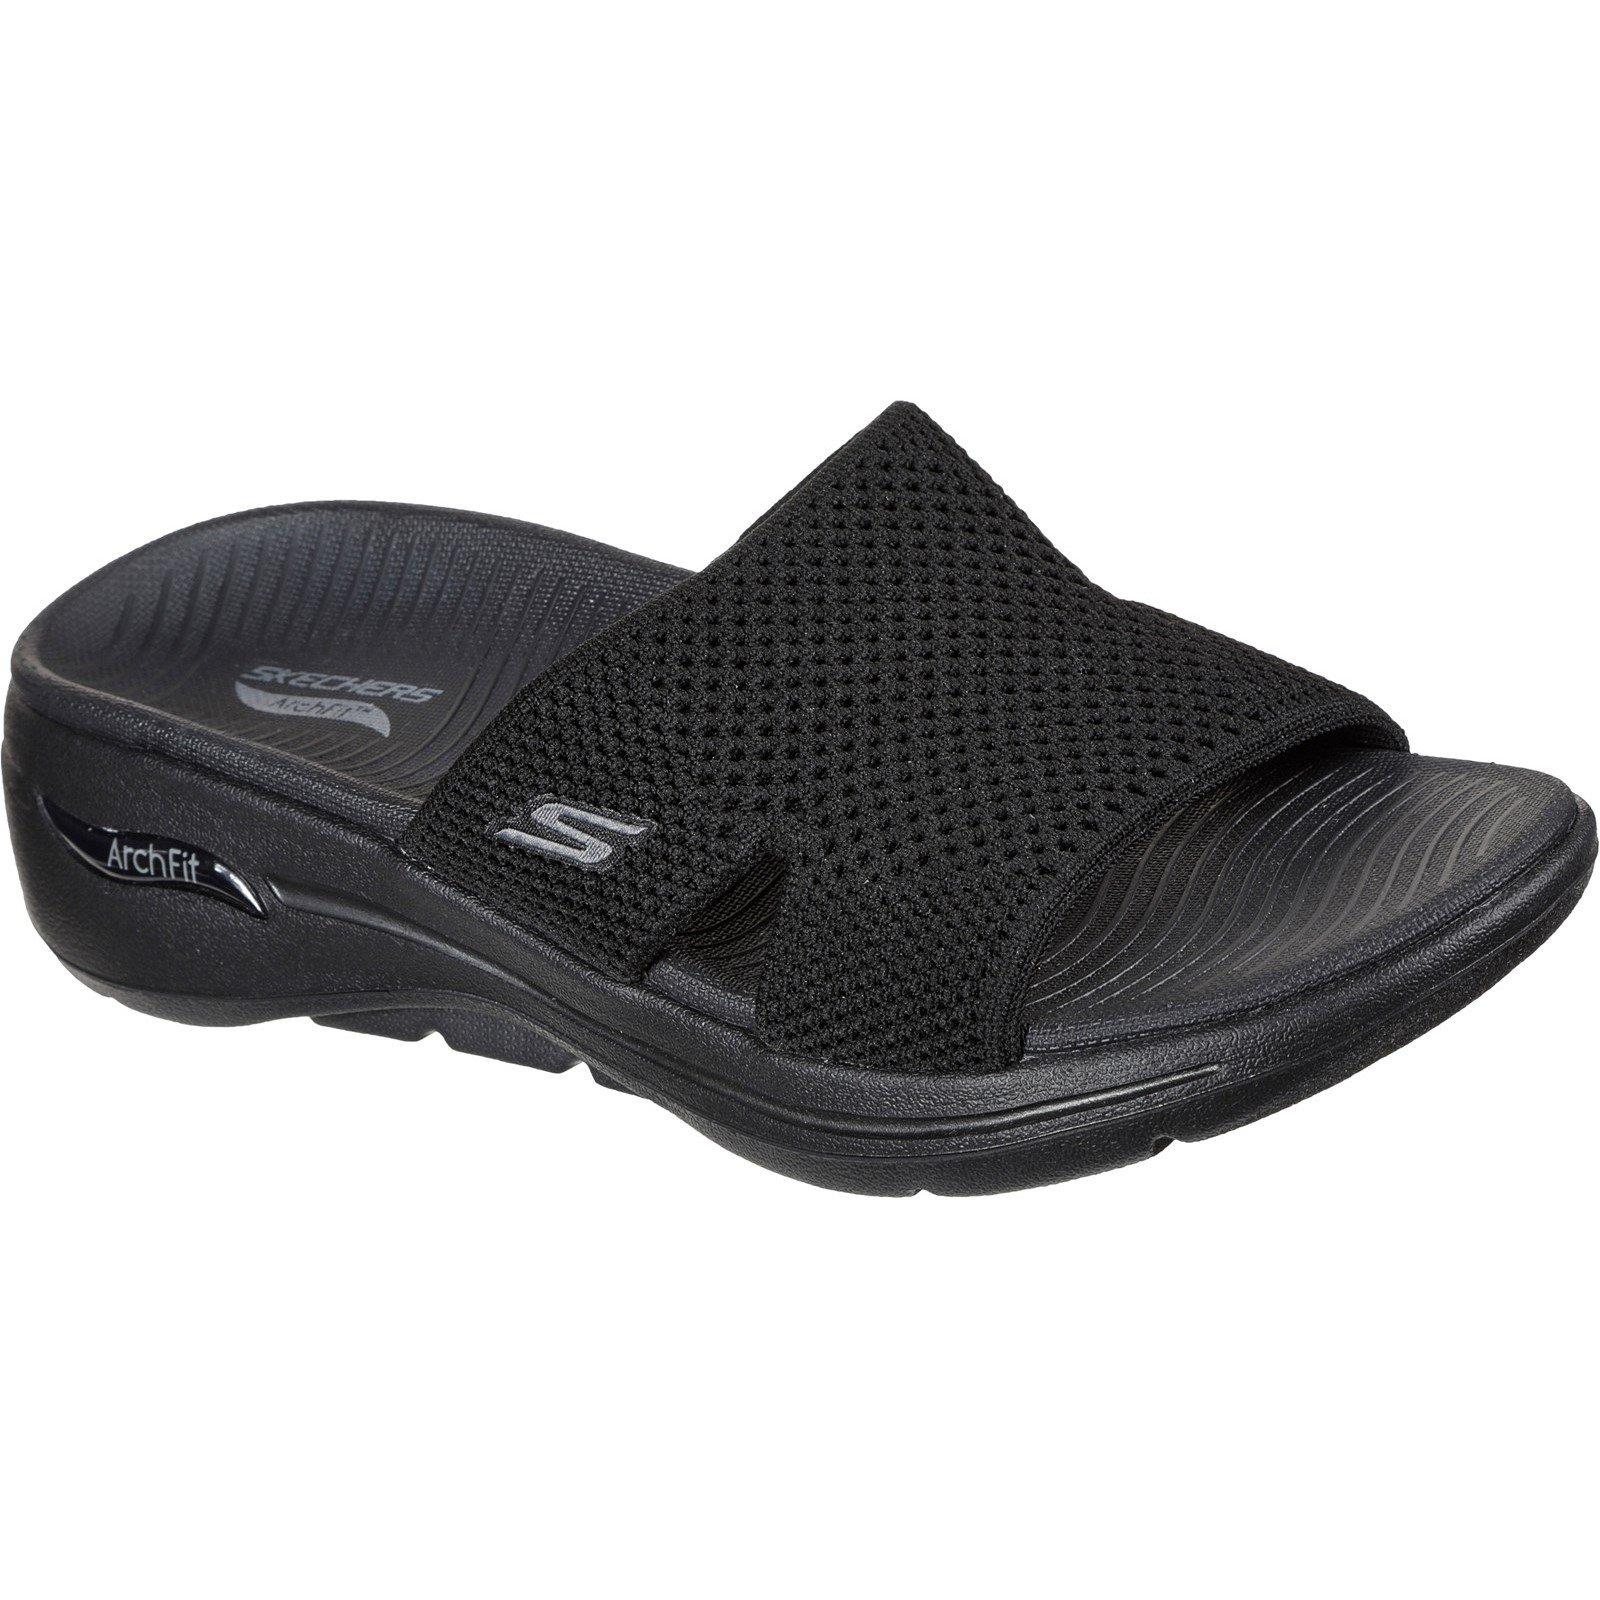 Skechers Women's Go Walk Arch Fit Worthy Summer Sandal Various Colours 32152 - Black 8